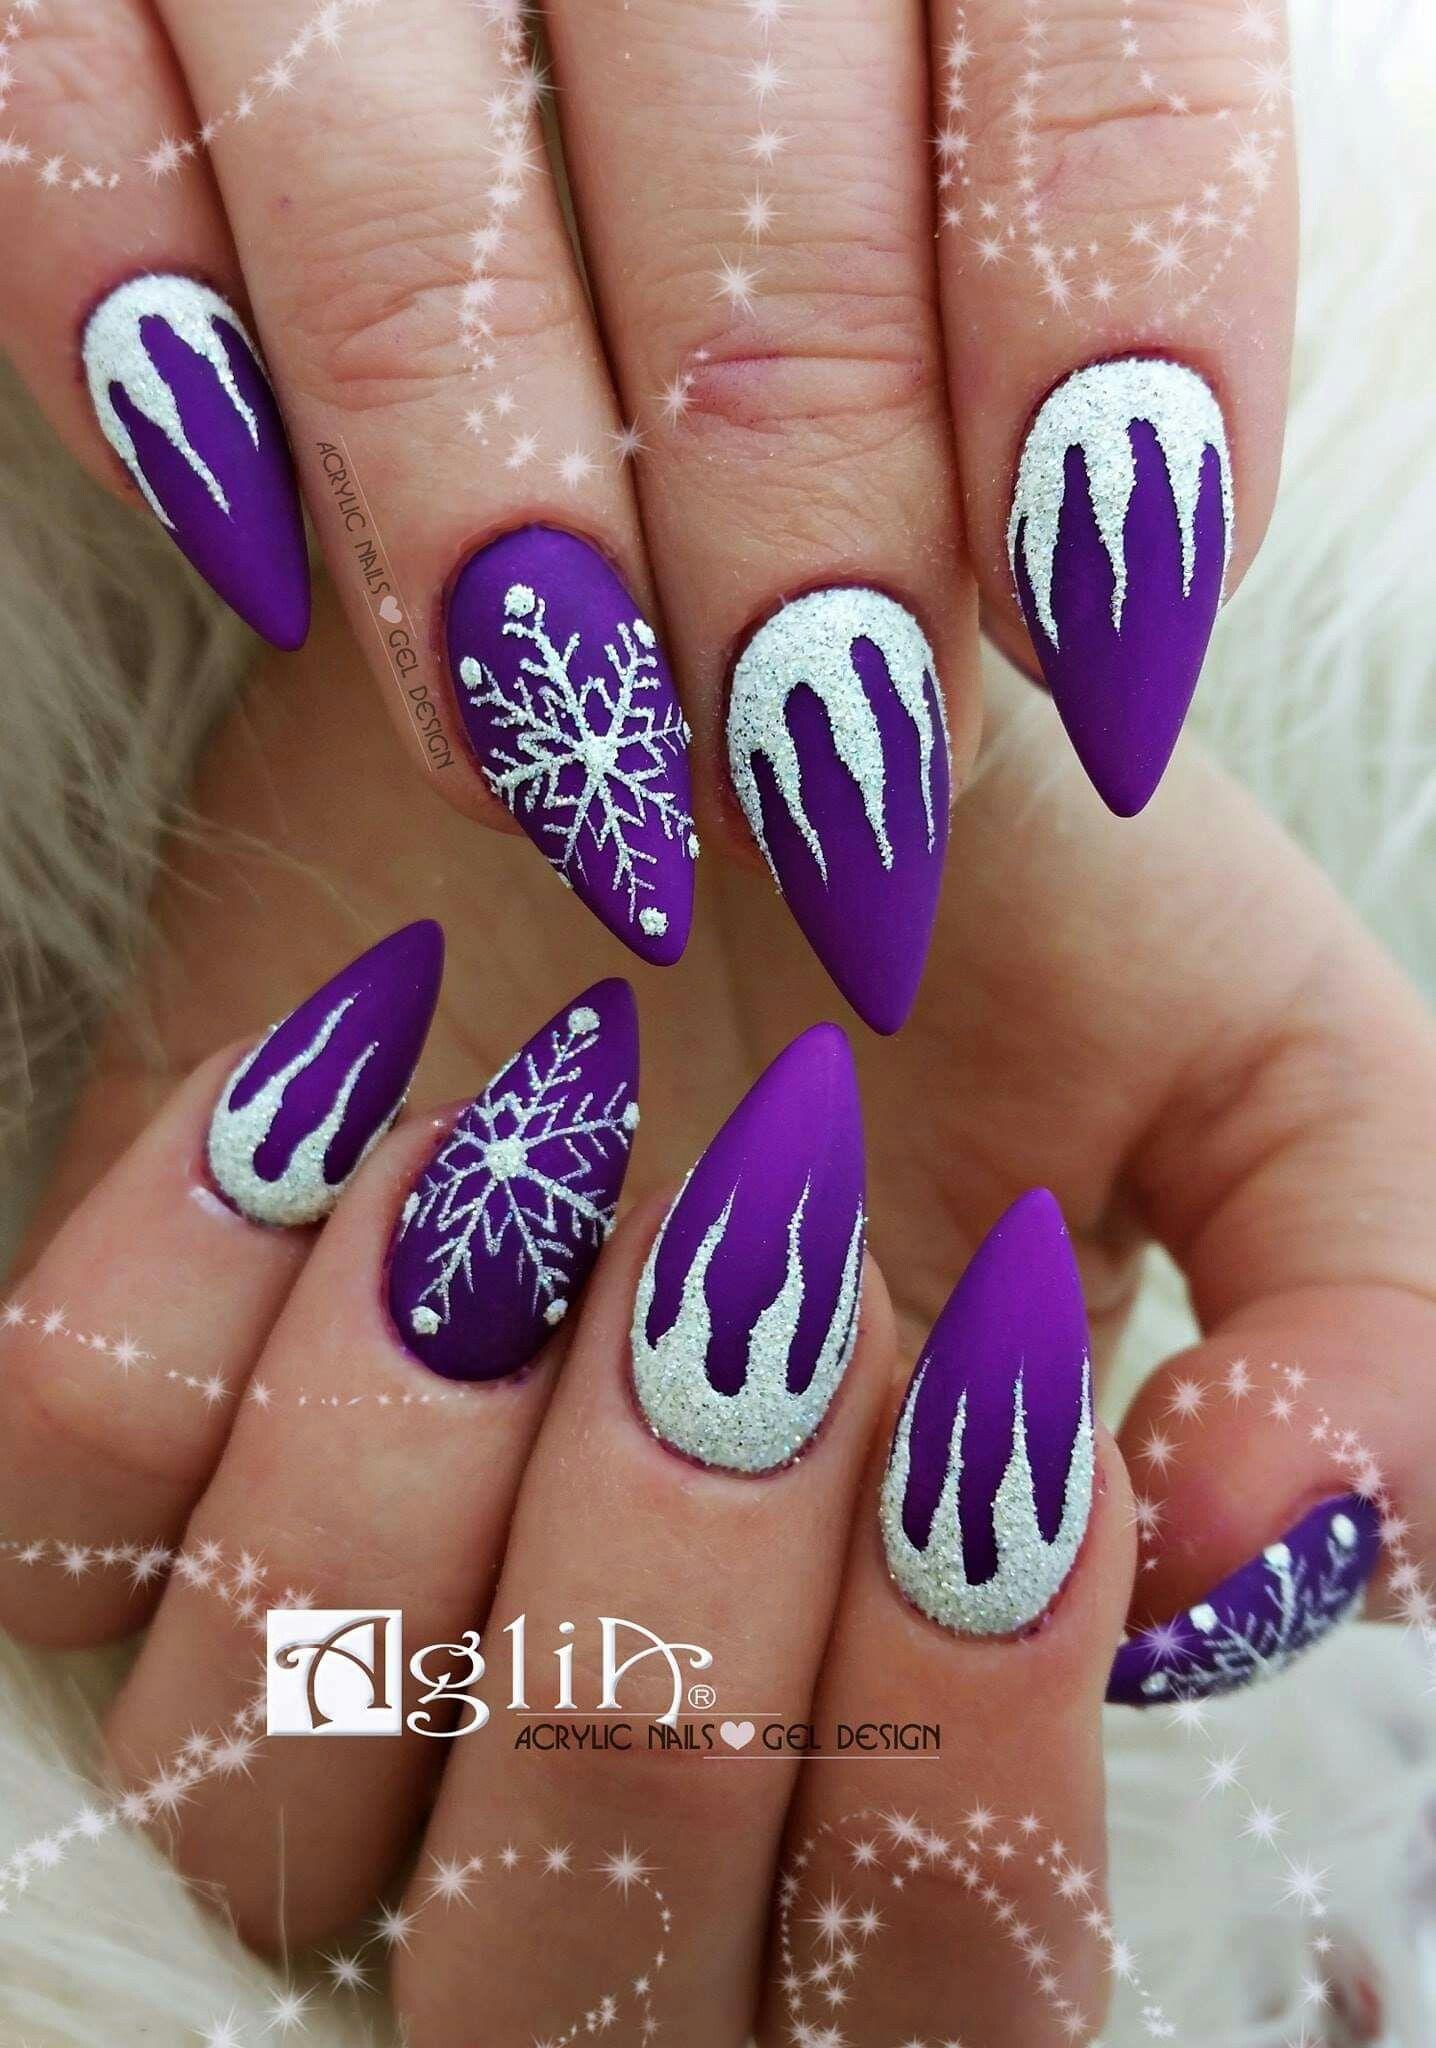 Acrylic Nails Gel Design Winter Nails Purple Matte Neon Nails